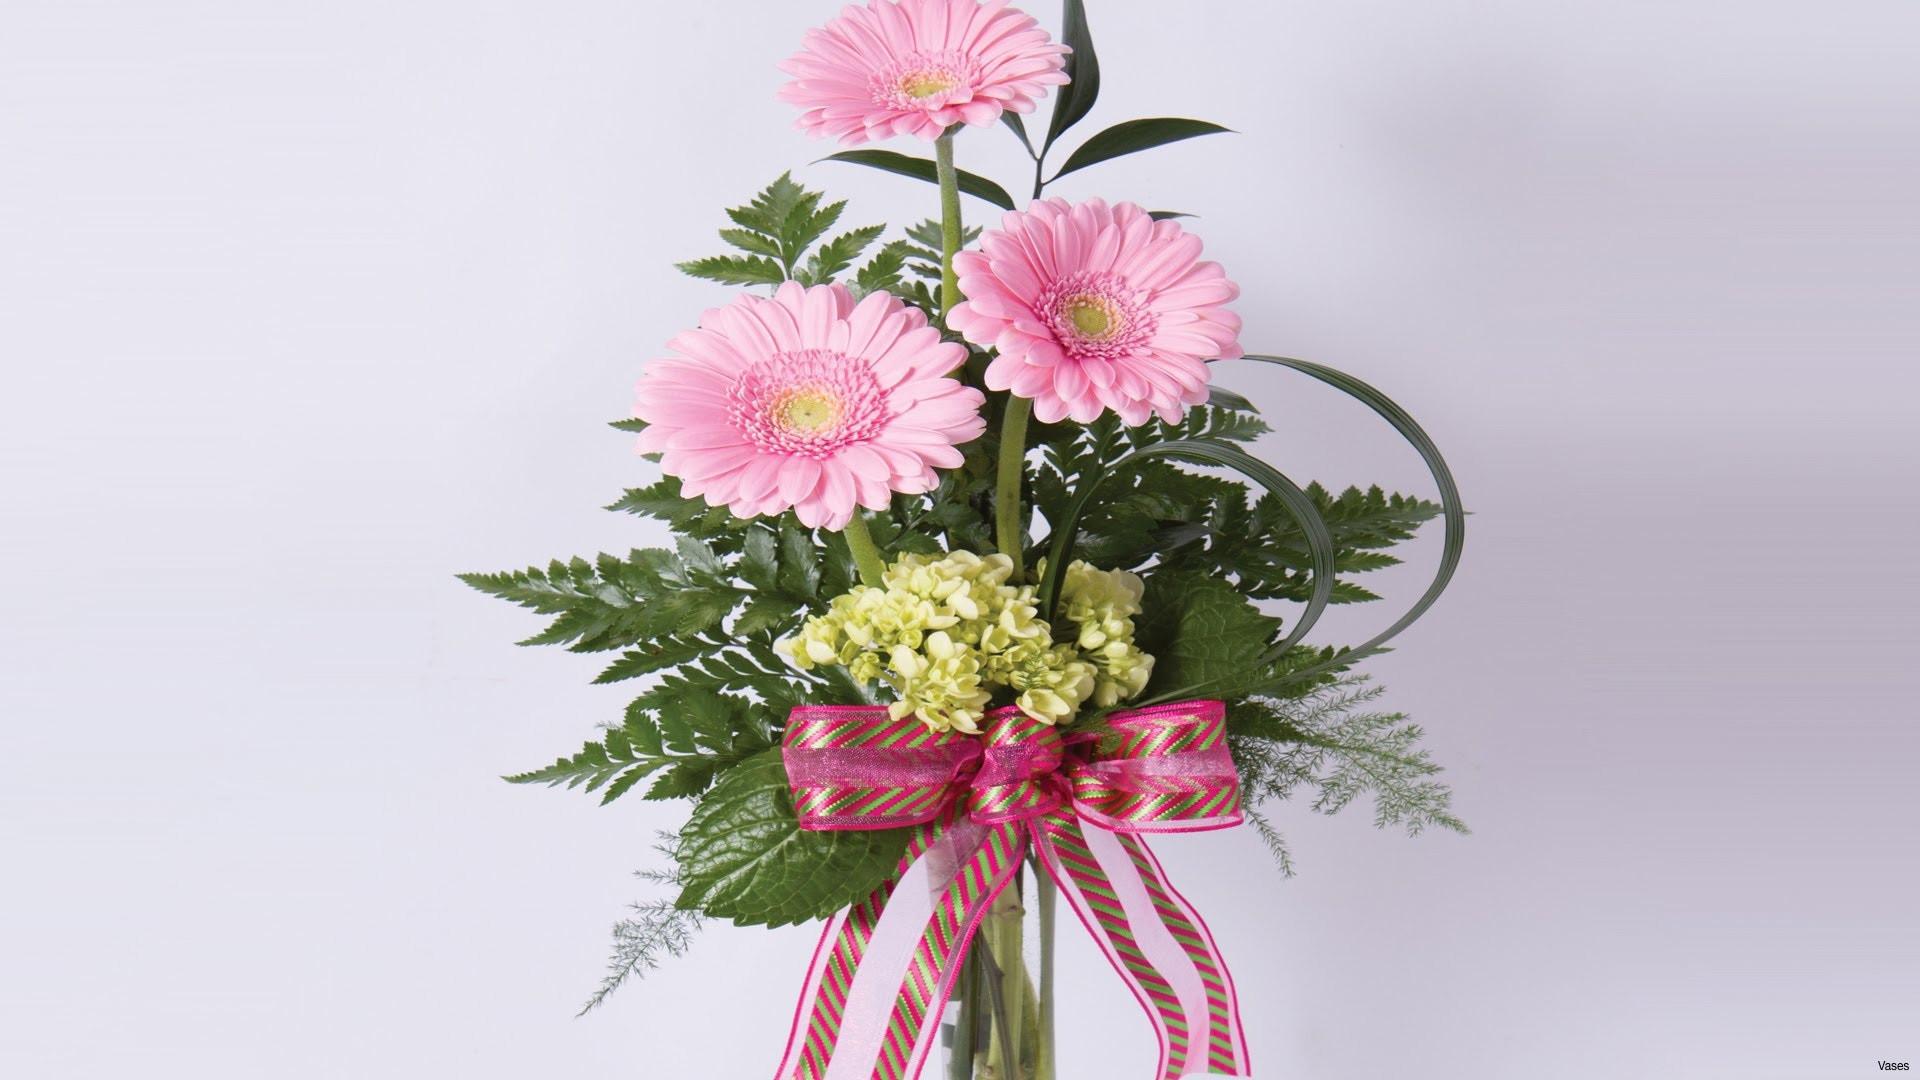 renoir vase of flowers of uncategorized floral arrangement inspiration within h vases bud vase flower arrangements i 0d for inspiration design design bouquet